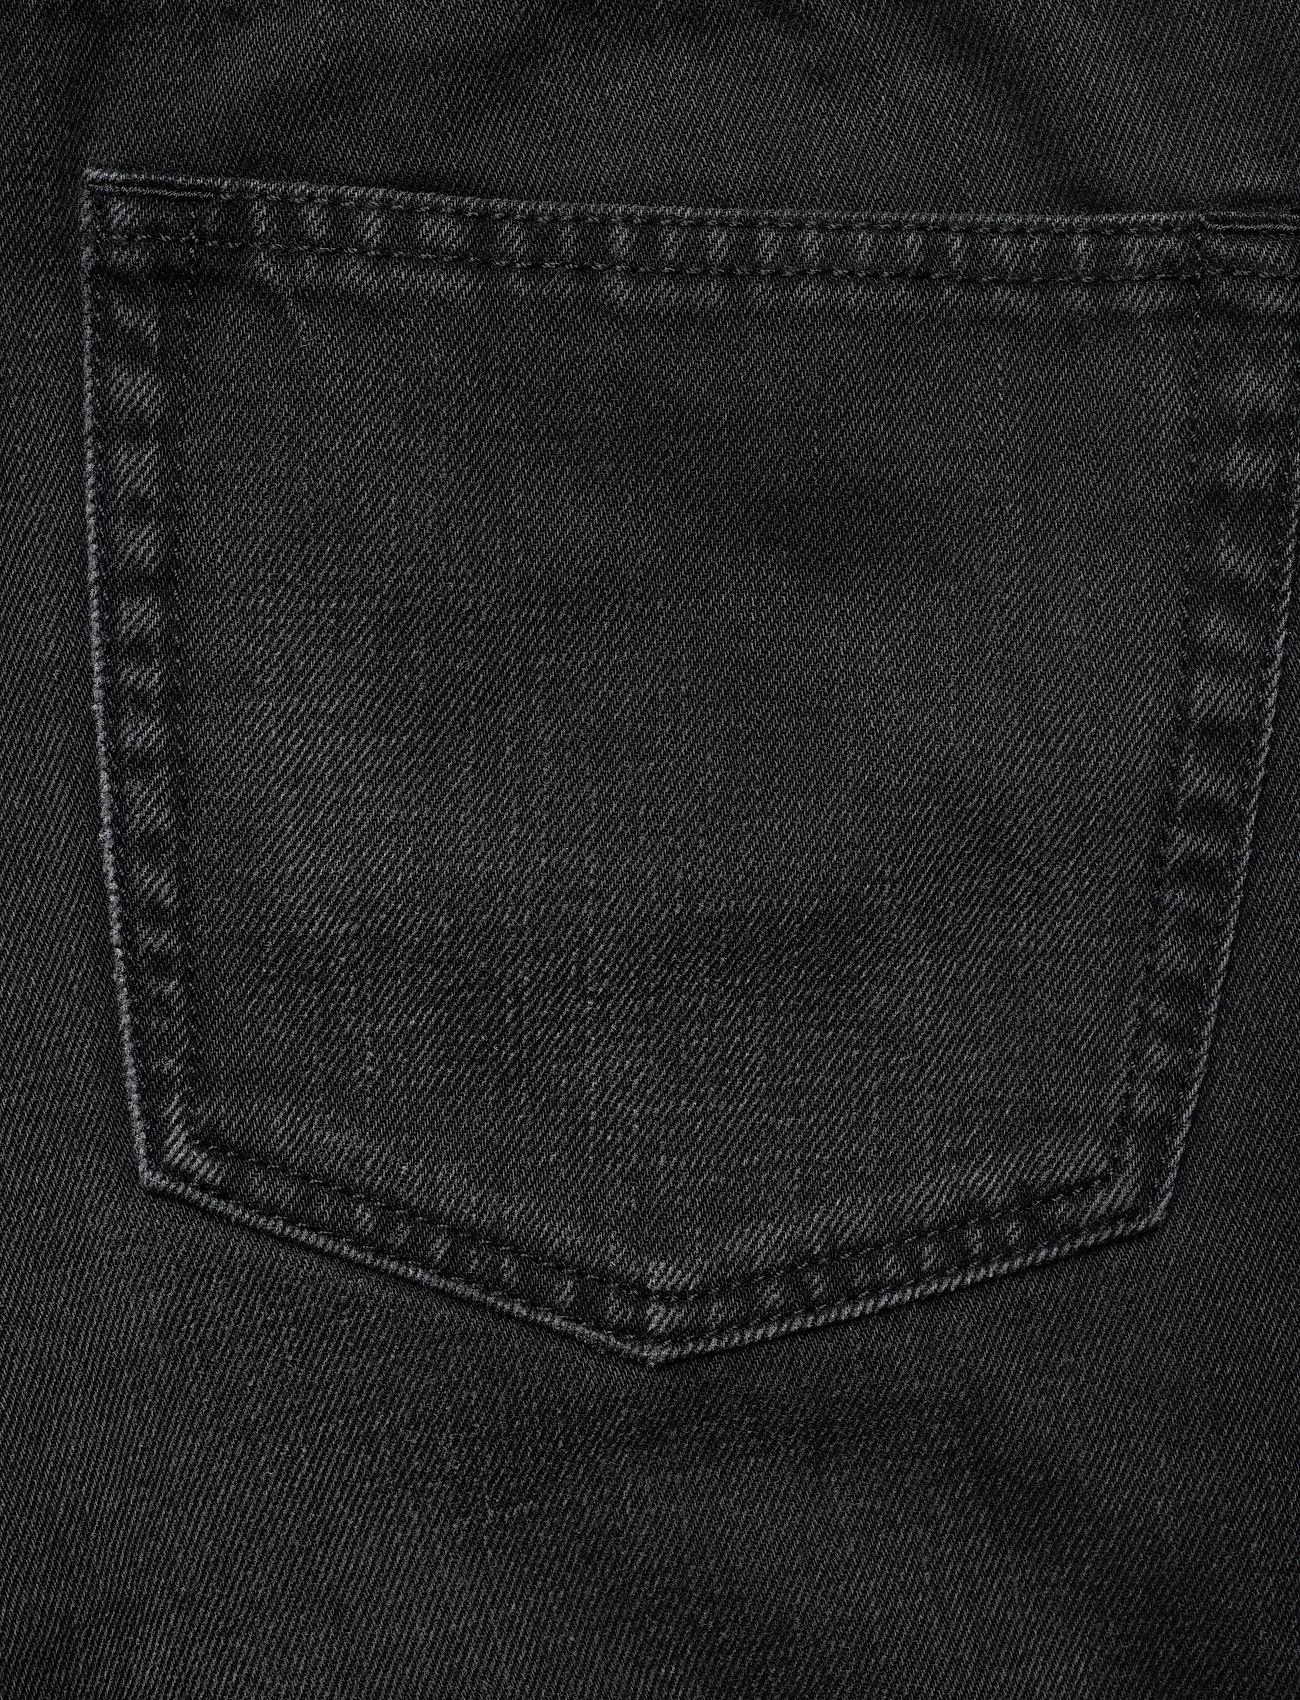 By Malina - Alexa jeans - straight regular - black - 8